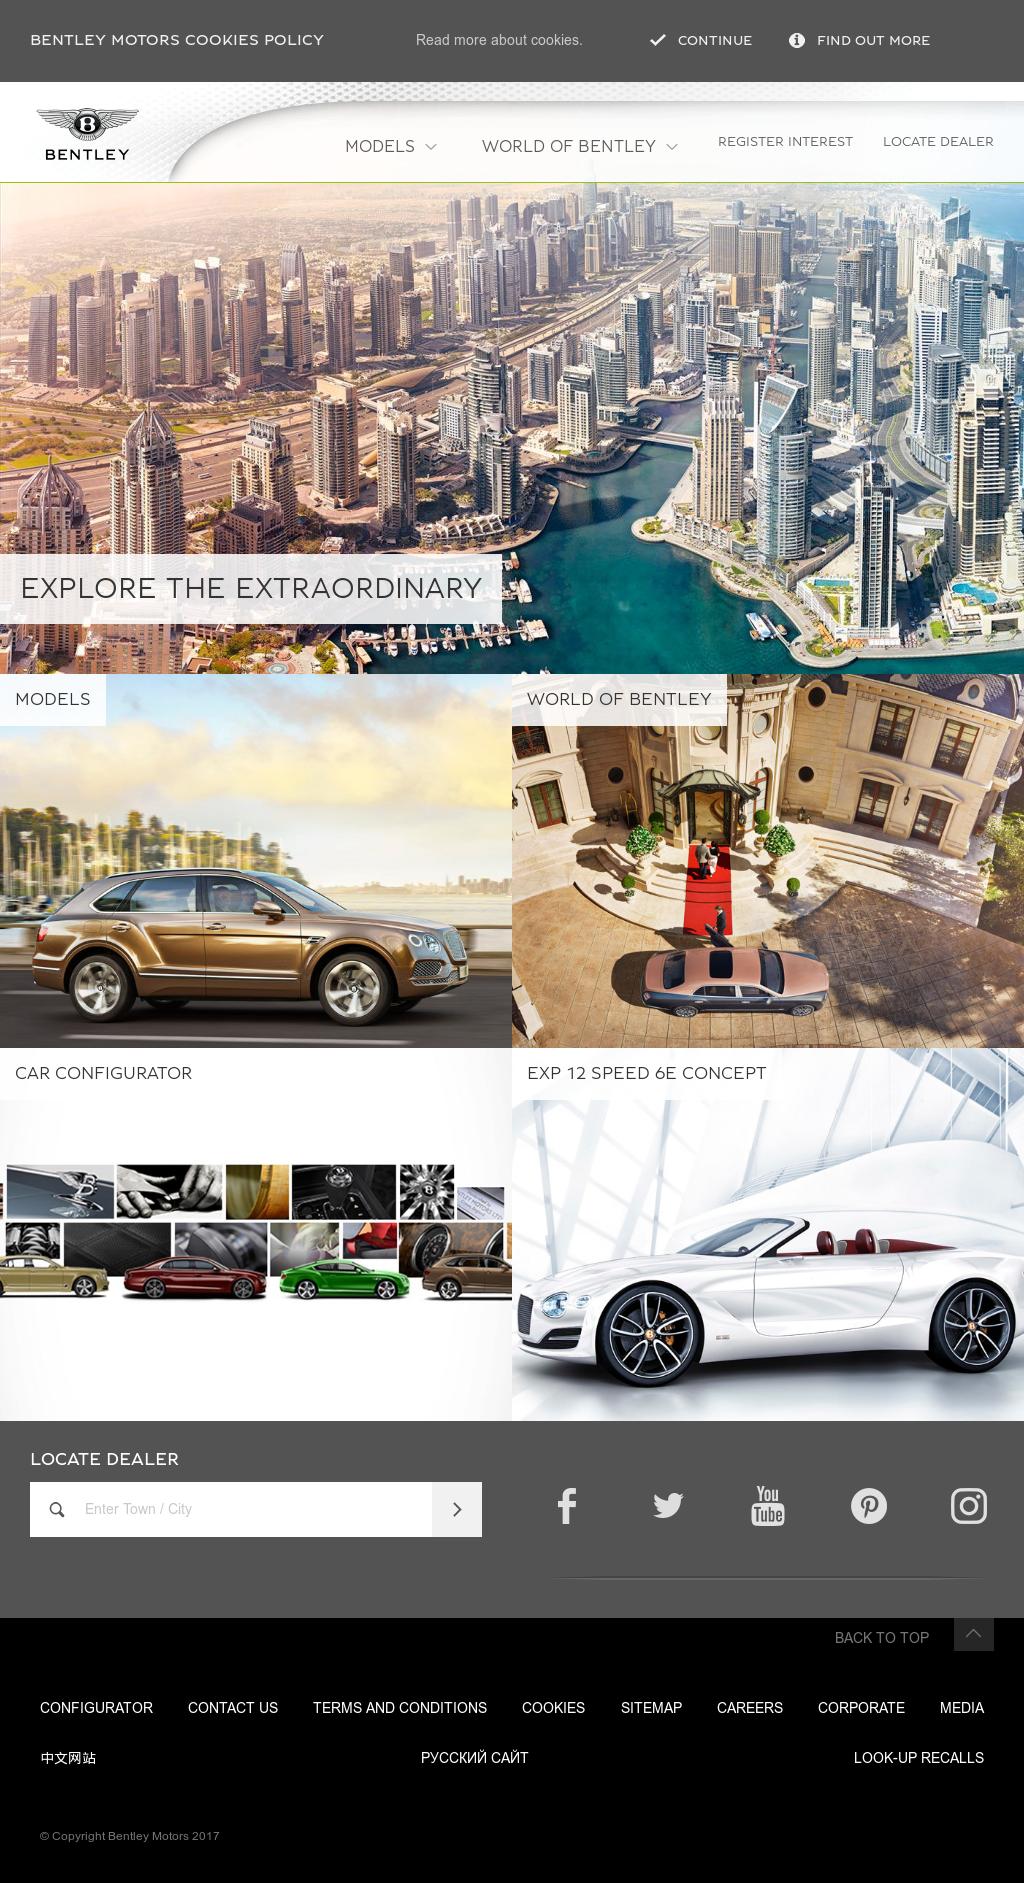 Bentley Motors petitors Revenue and Employees Owler pany